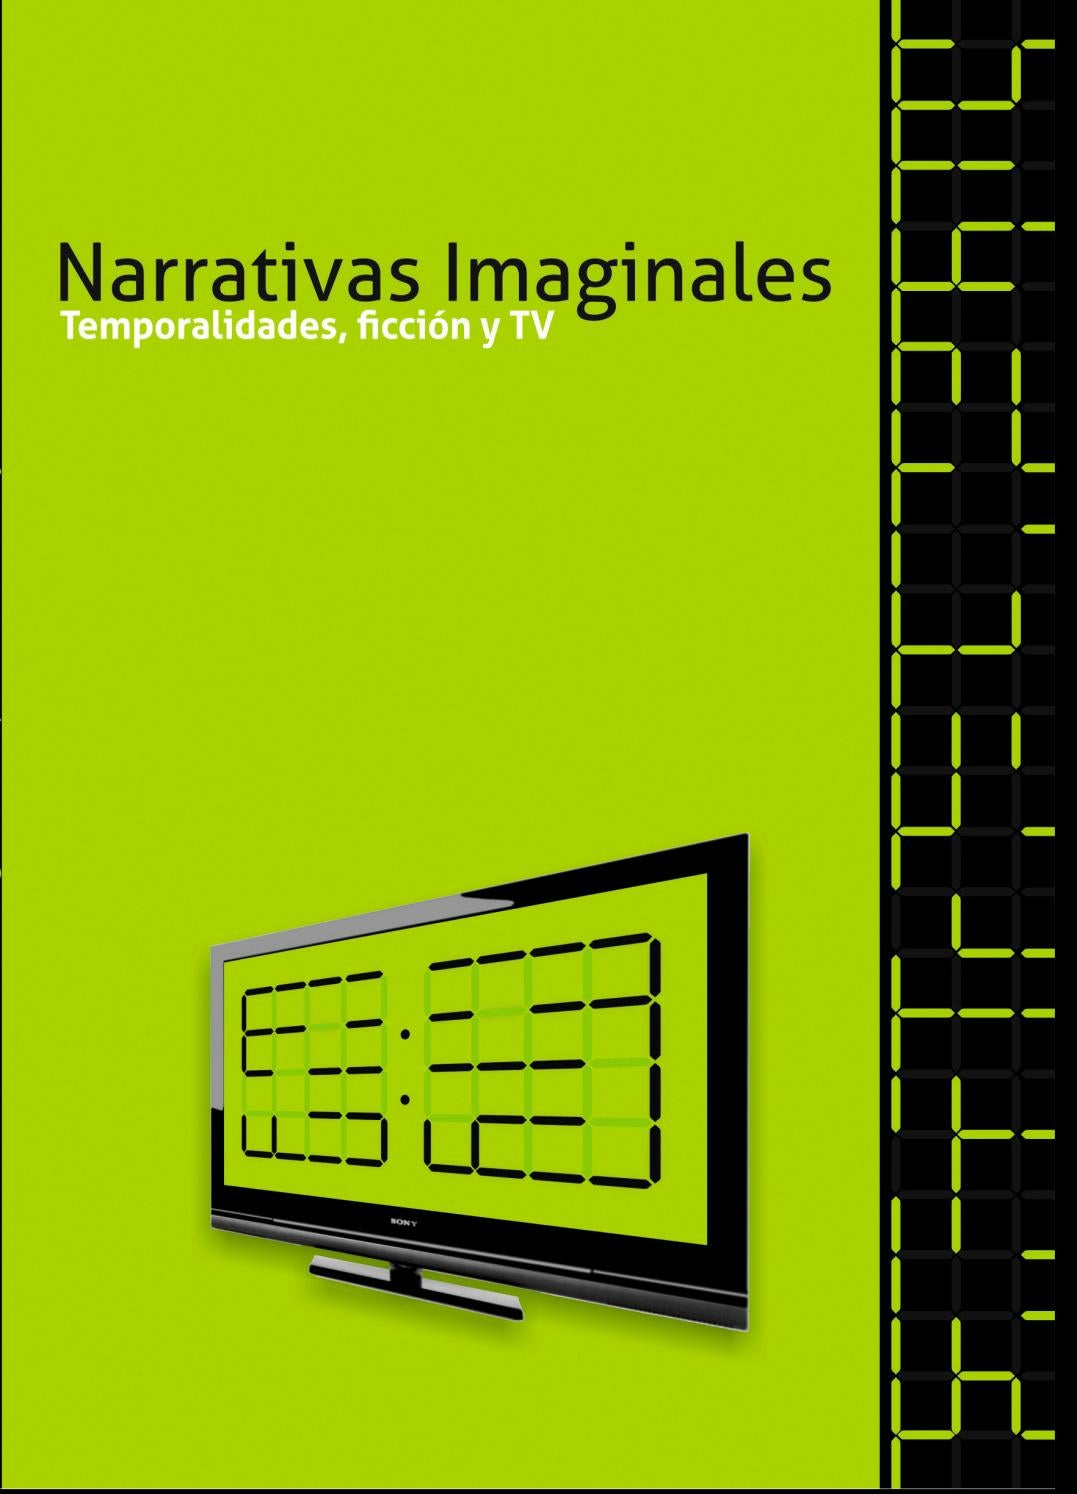 Narrativas imaginales by La Imagen Imaginada - issuu